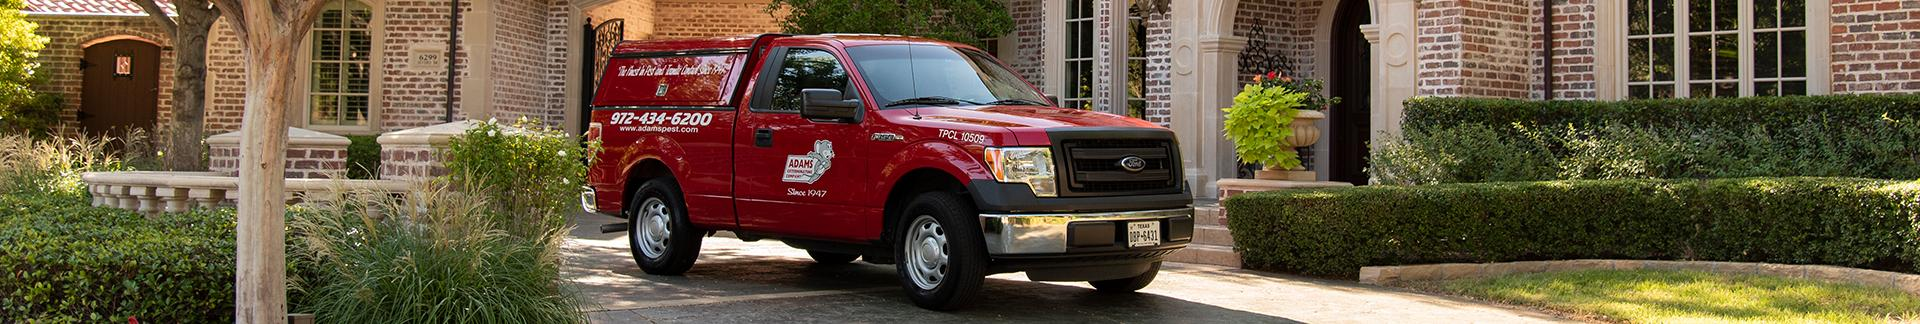 adams pest control's truck in pilot point texas